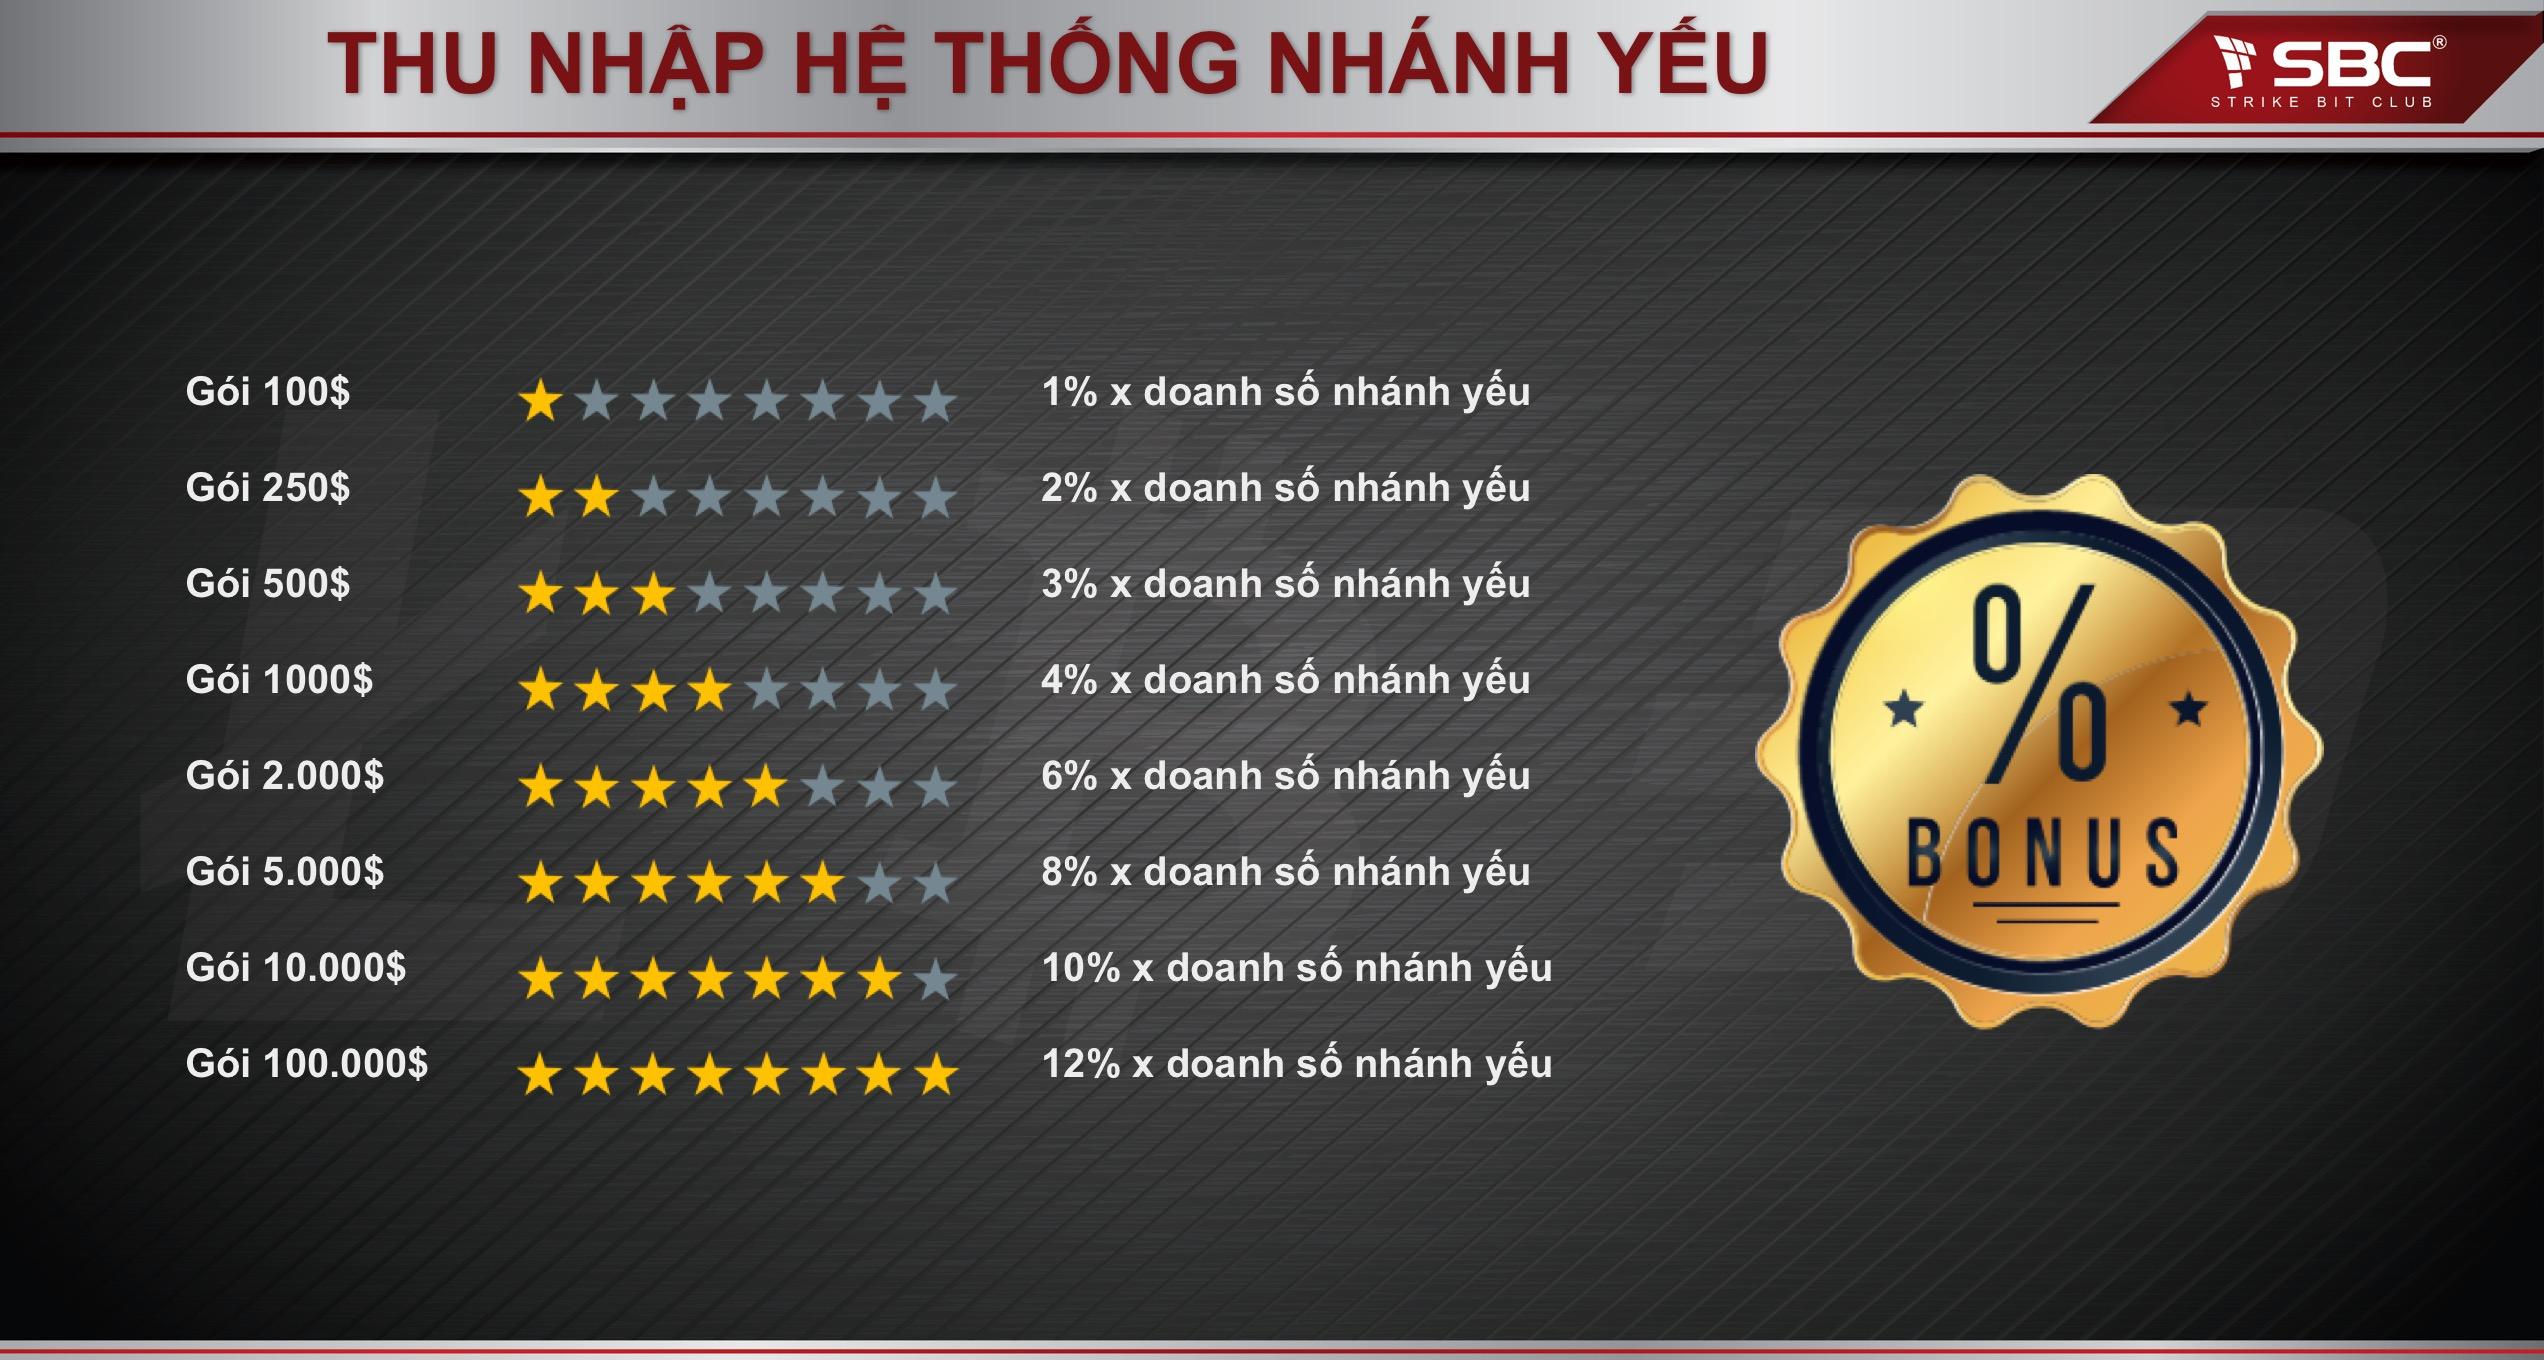 akinhdoanhthongminh.net_userfiles_image_thu_nhap_nhanh_yeu_strike_bit_club.